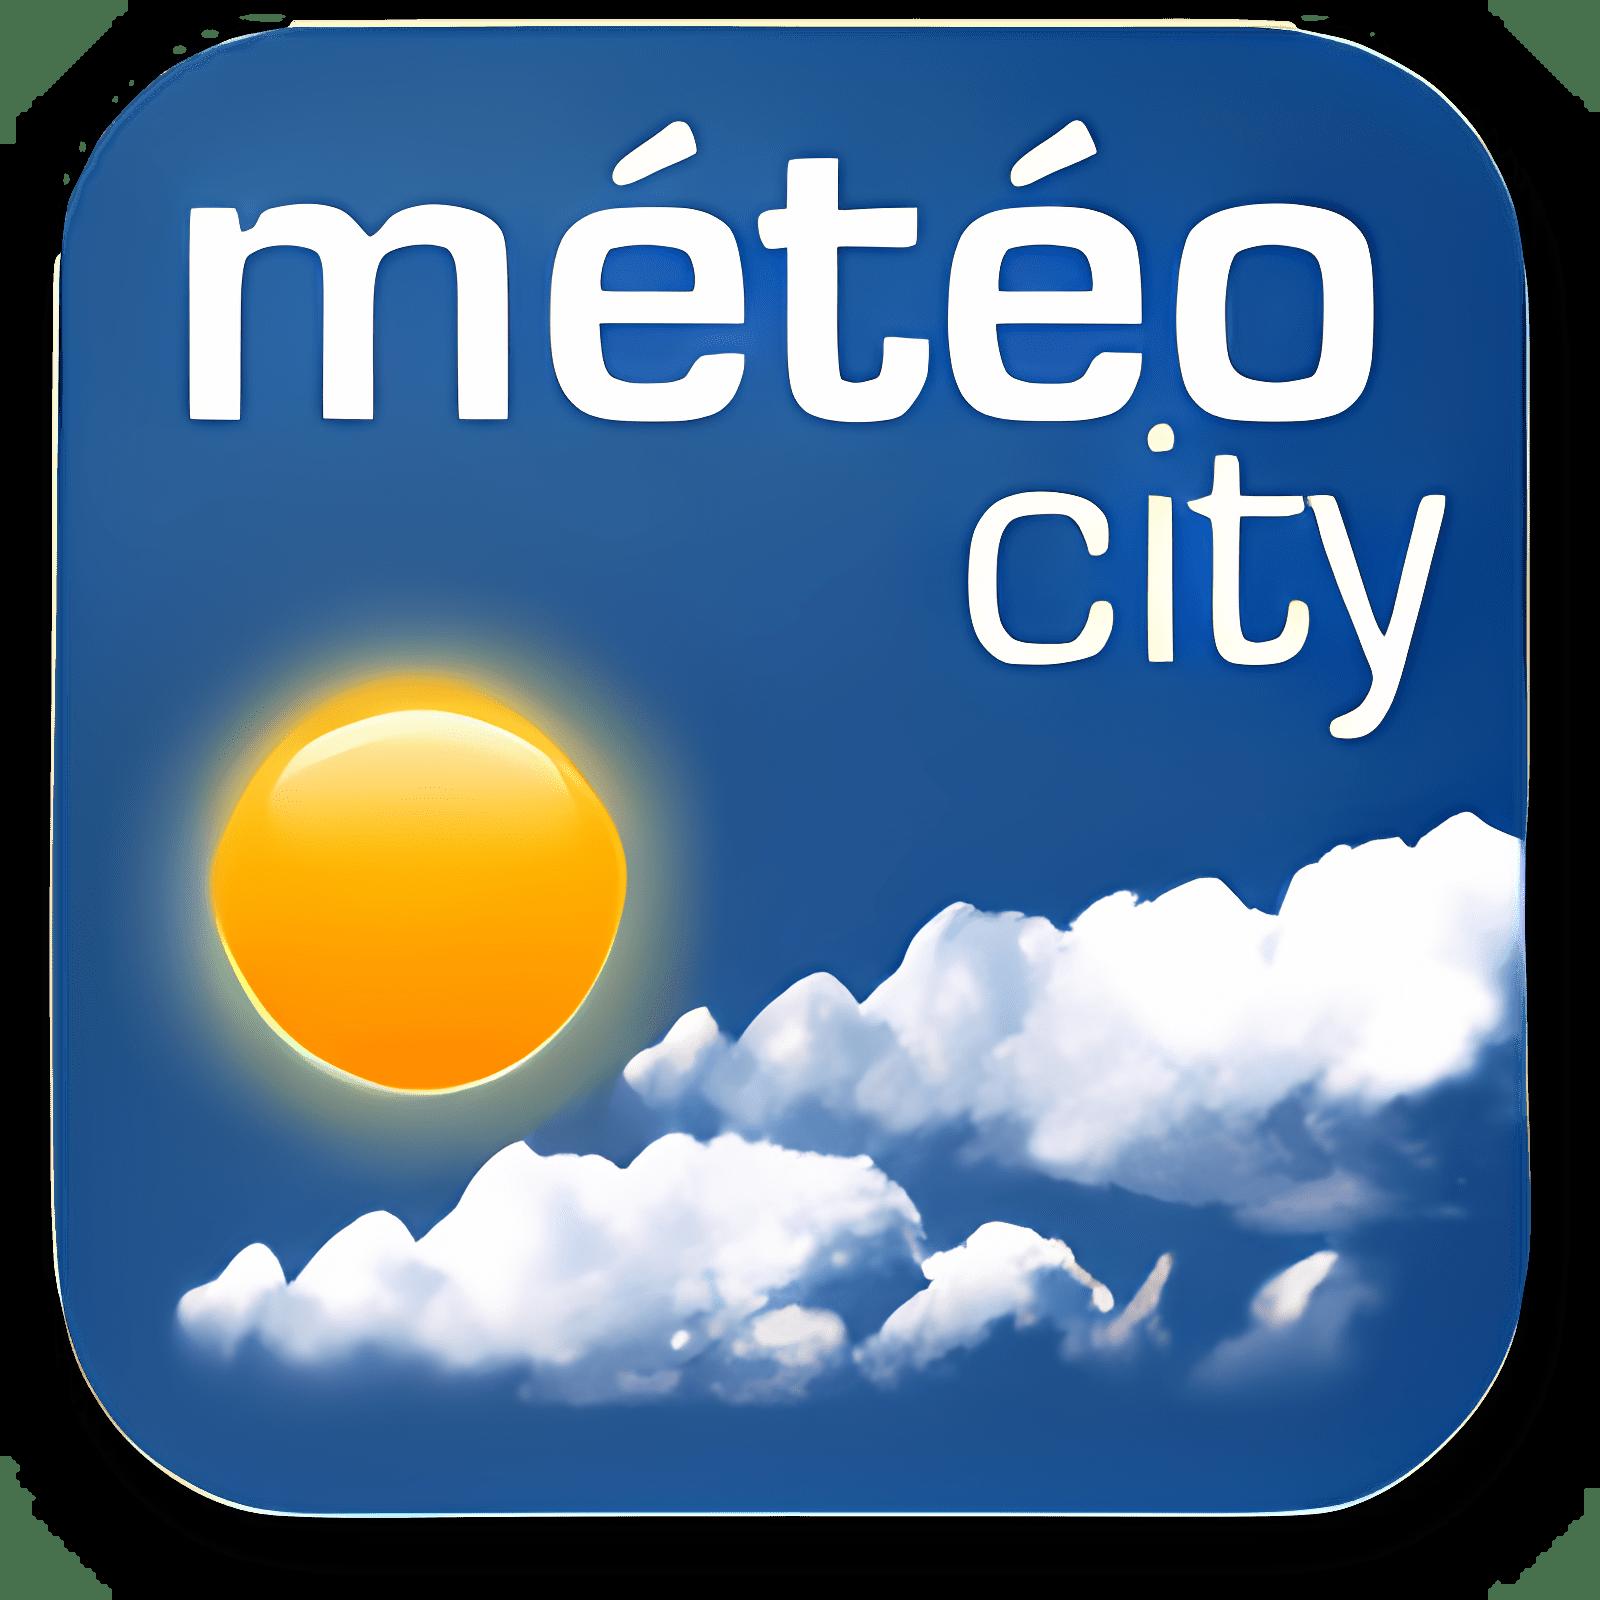 Meteocity.com